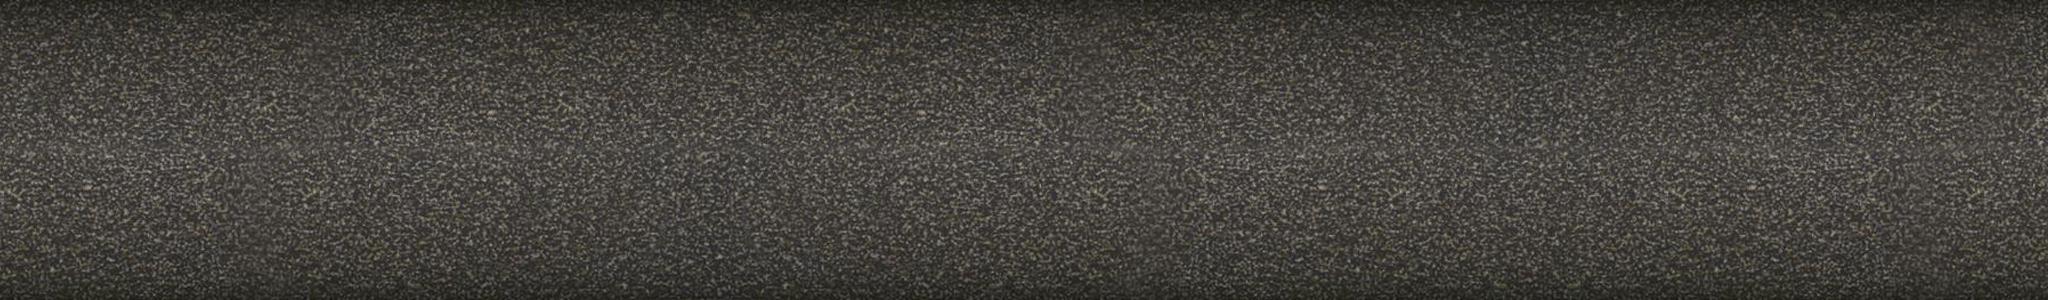 HU 19582 ABS hrana černá hladká mat